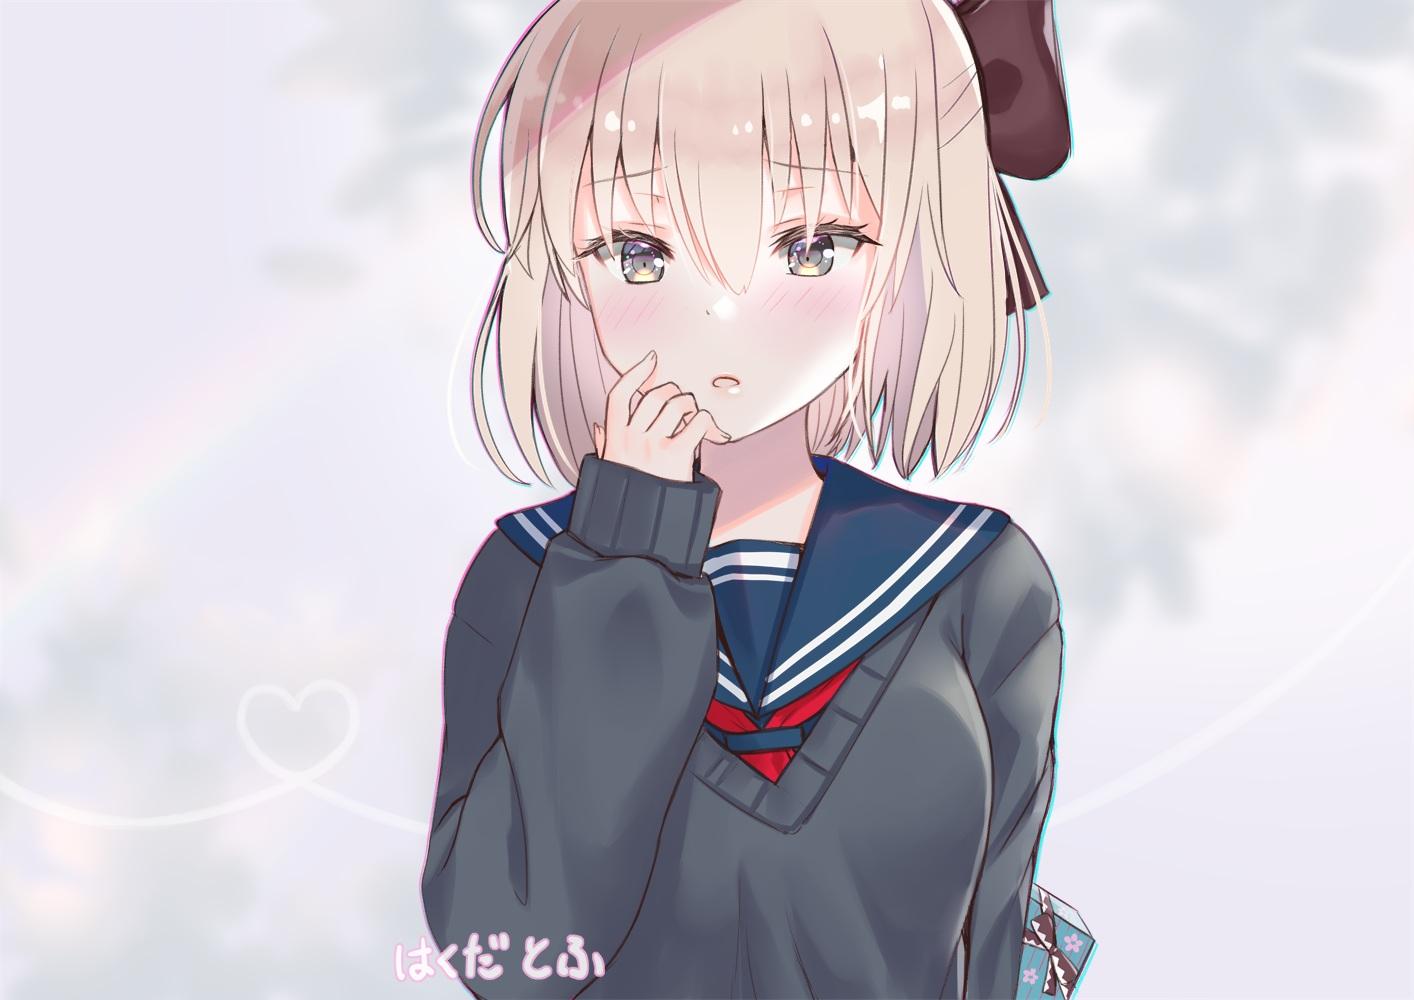 blonde_hair blush fate/grand_order fate_(series) hakudatofu okita_souji_(fate) school_uniform short_hair watermark